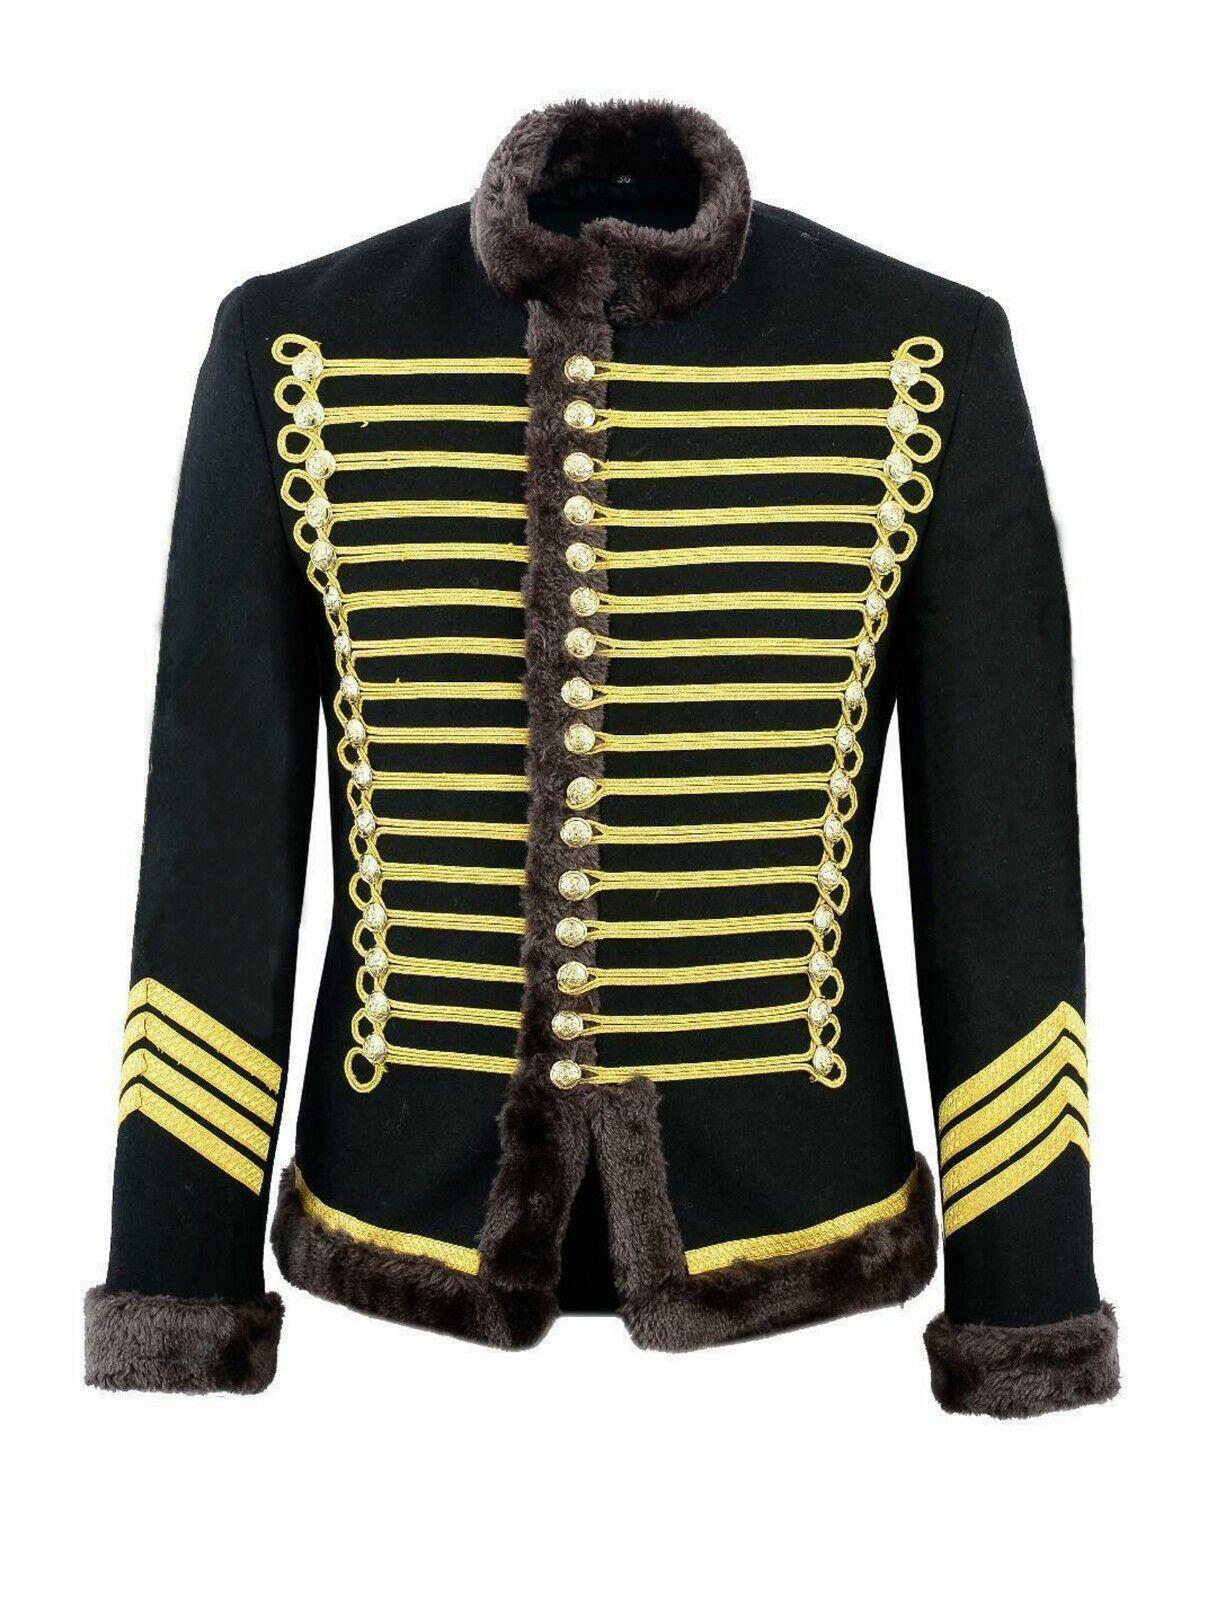 Hussar Jimi Hendrix Inspirot Parade jacke Military Drummer Officer Faux Fur